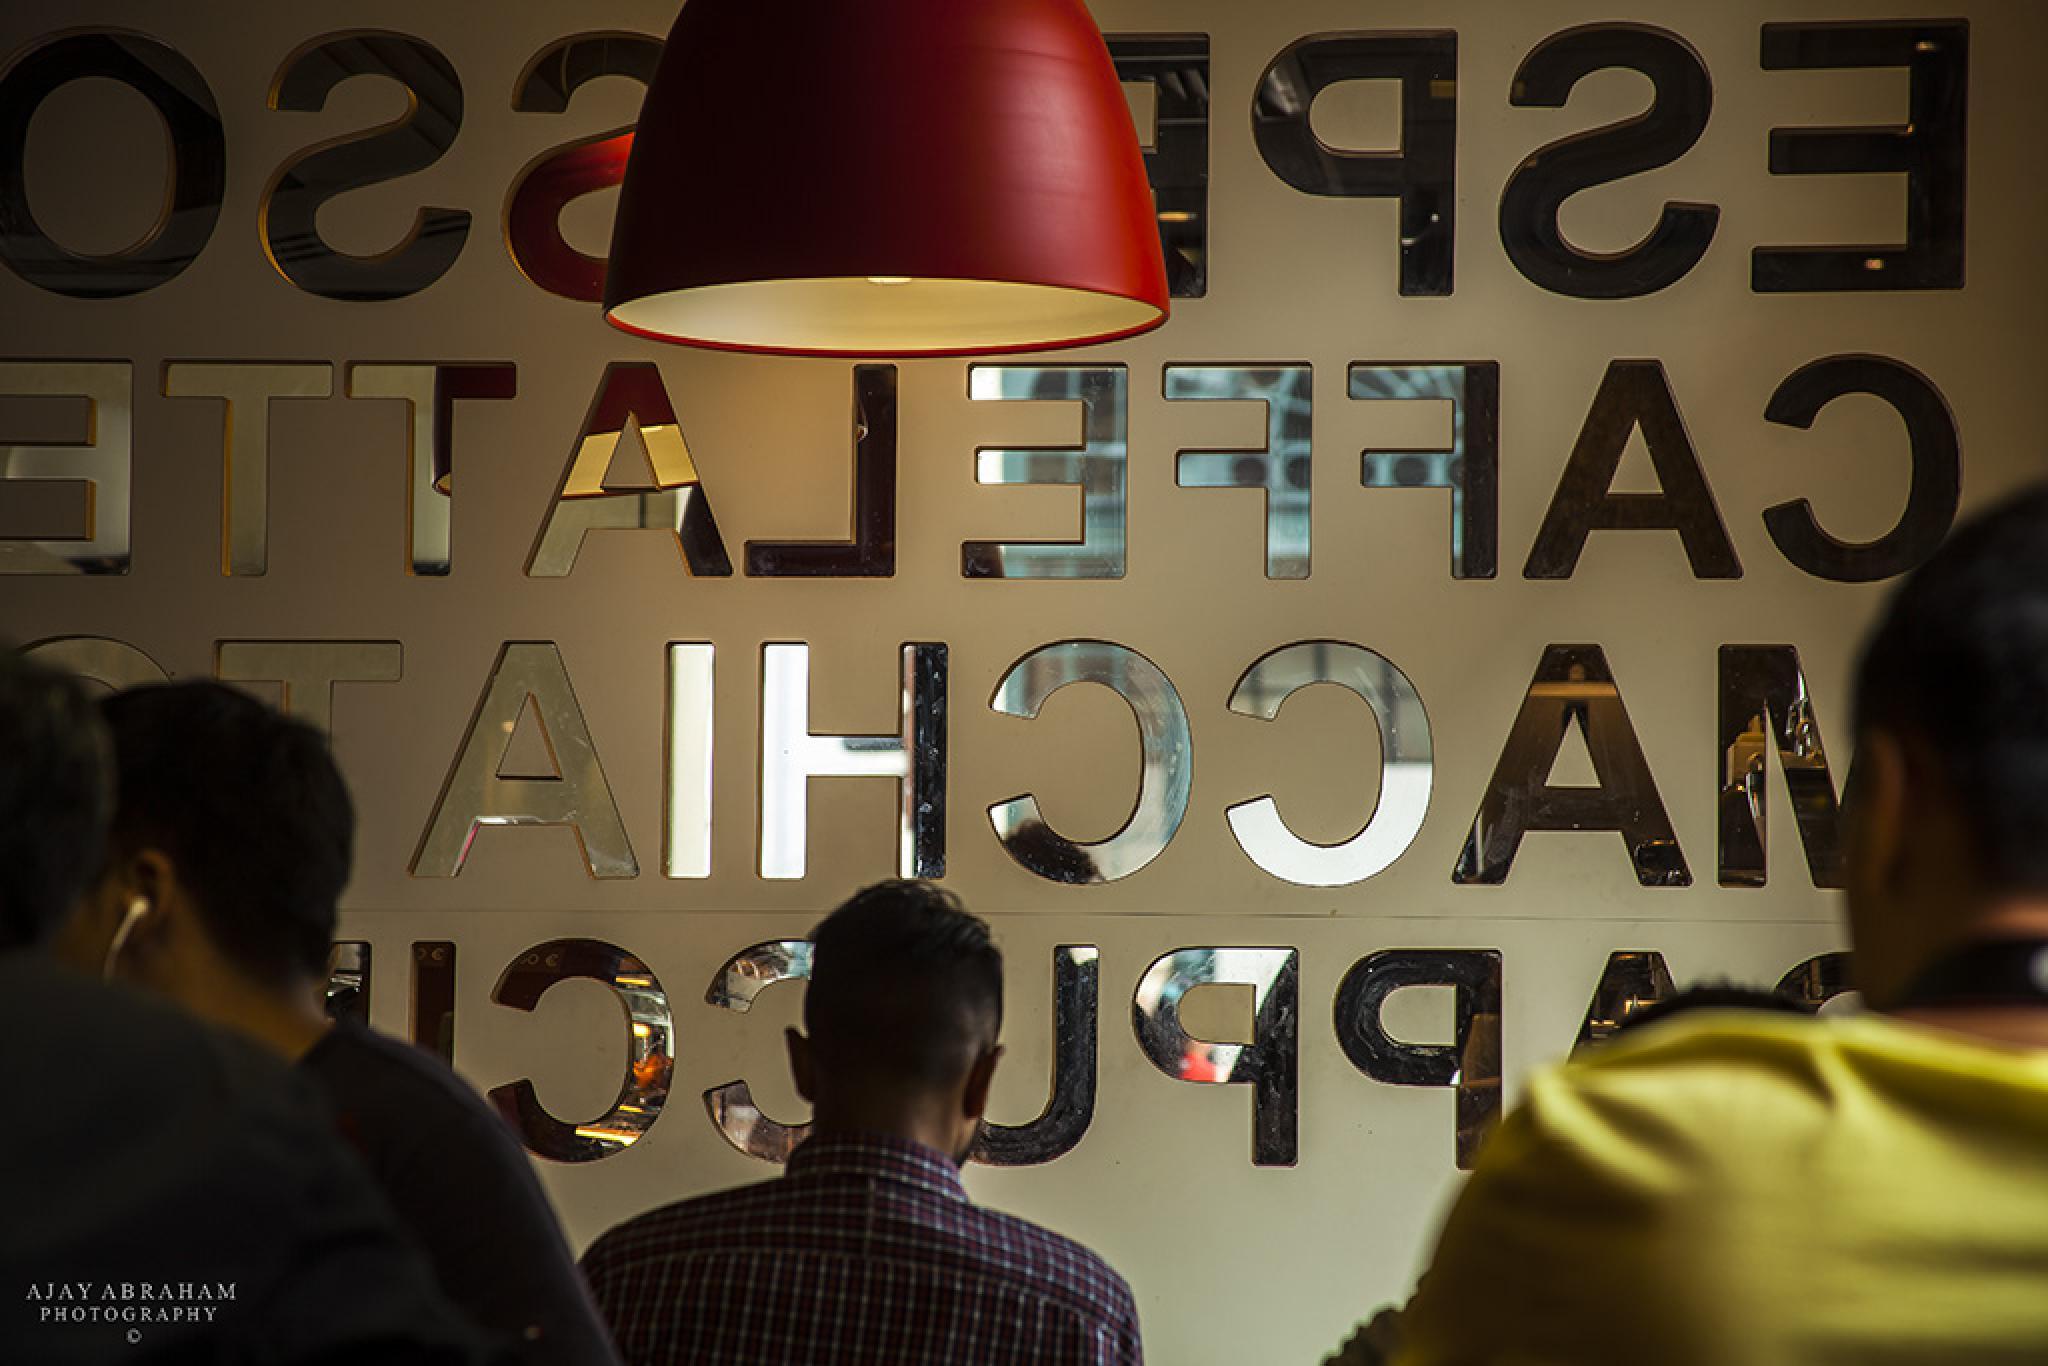 Cafe Mcdonalds by ajayabraham2